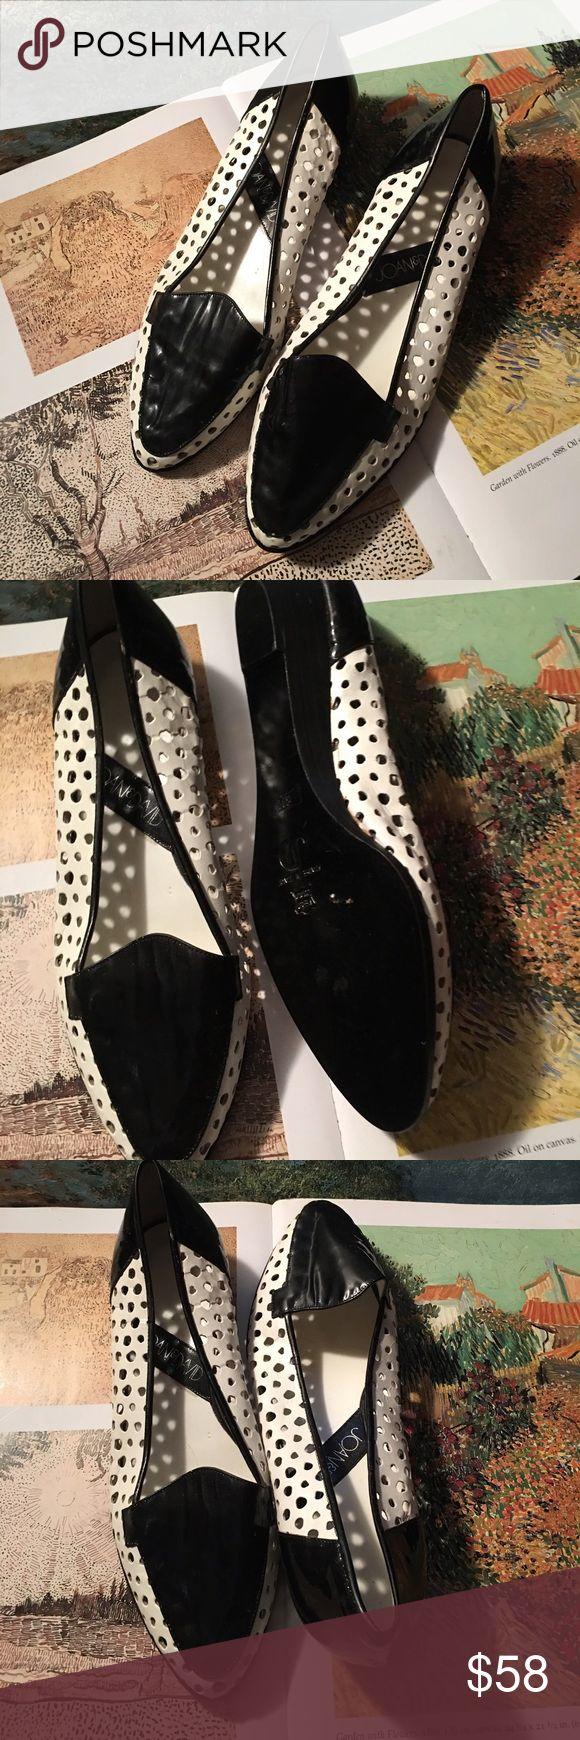 Joan & David Vintage Joan & David, Made in Italy Joan & David Shoes Flats & Loafers